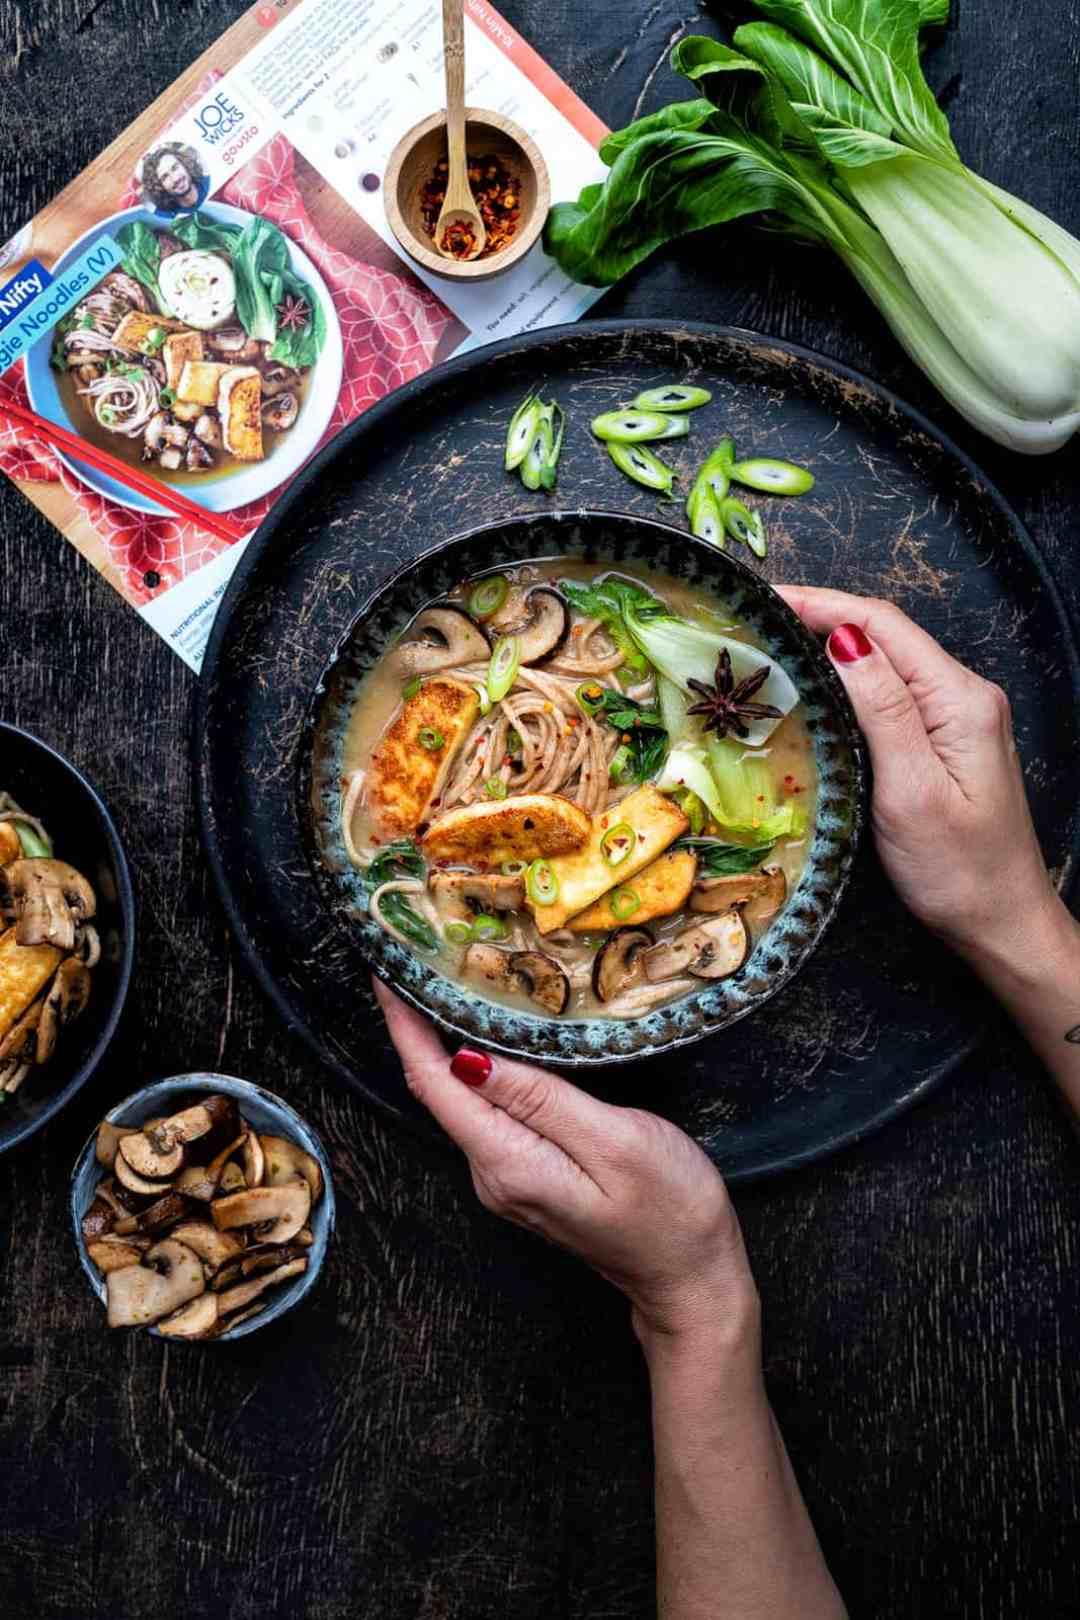 Joe Wicks for Gousto: 10 minute veggie noodles